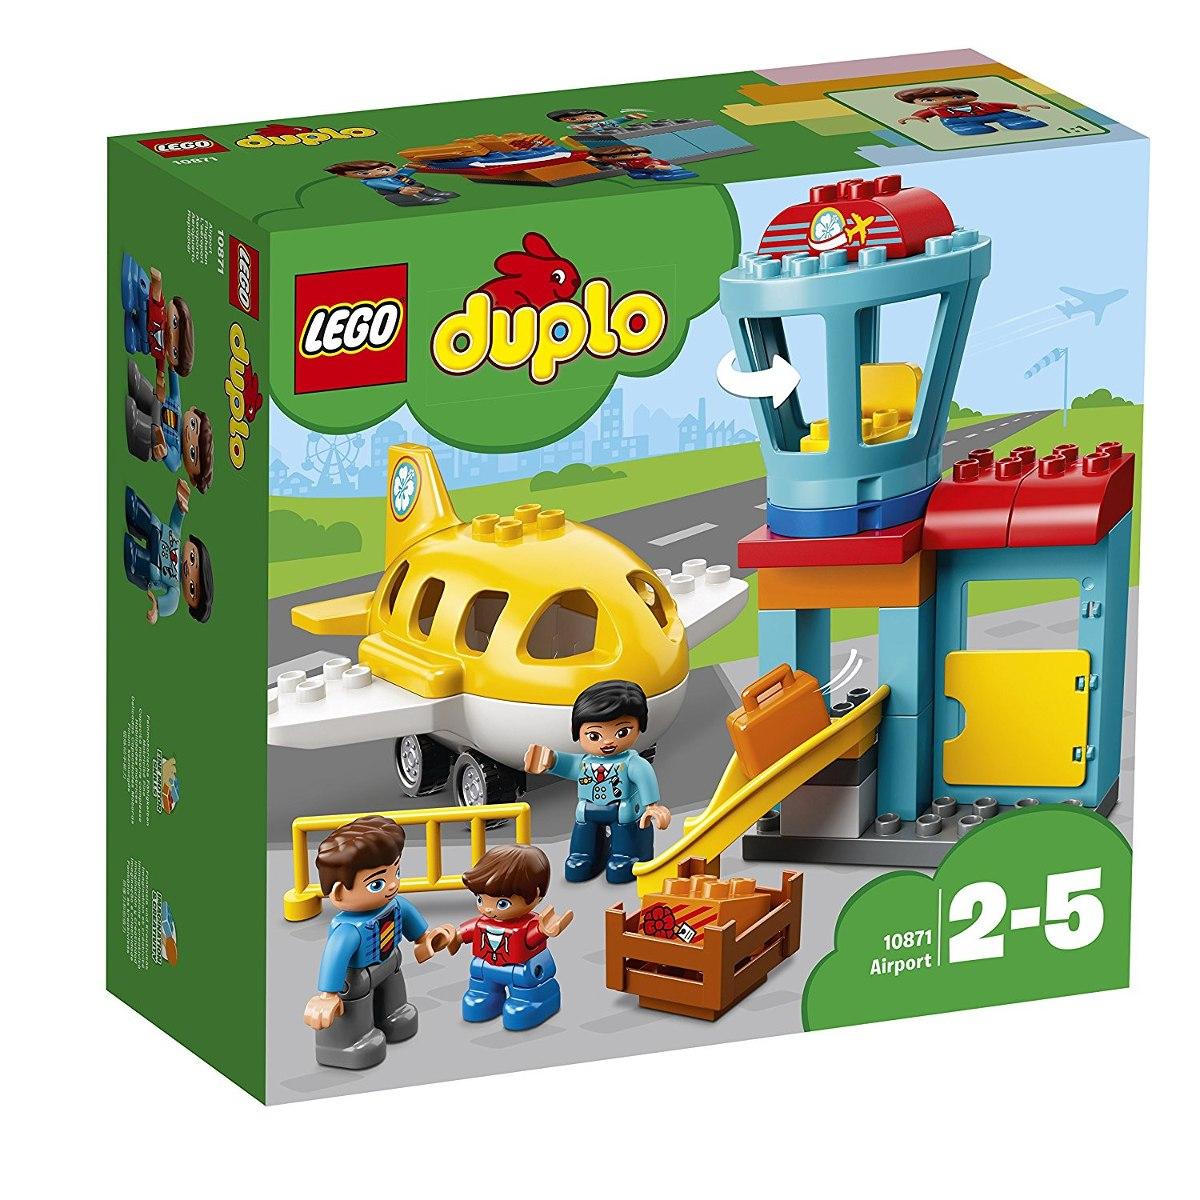 Aeroporto Lego : Lego duplo aeroporto lego r em mercado livre